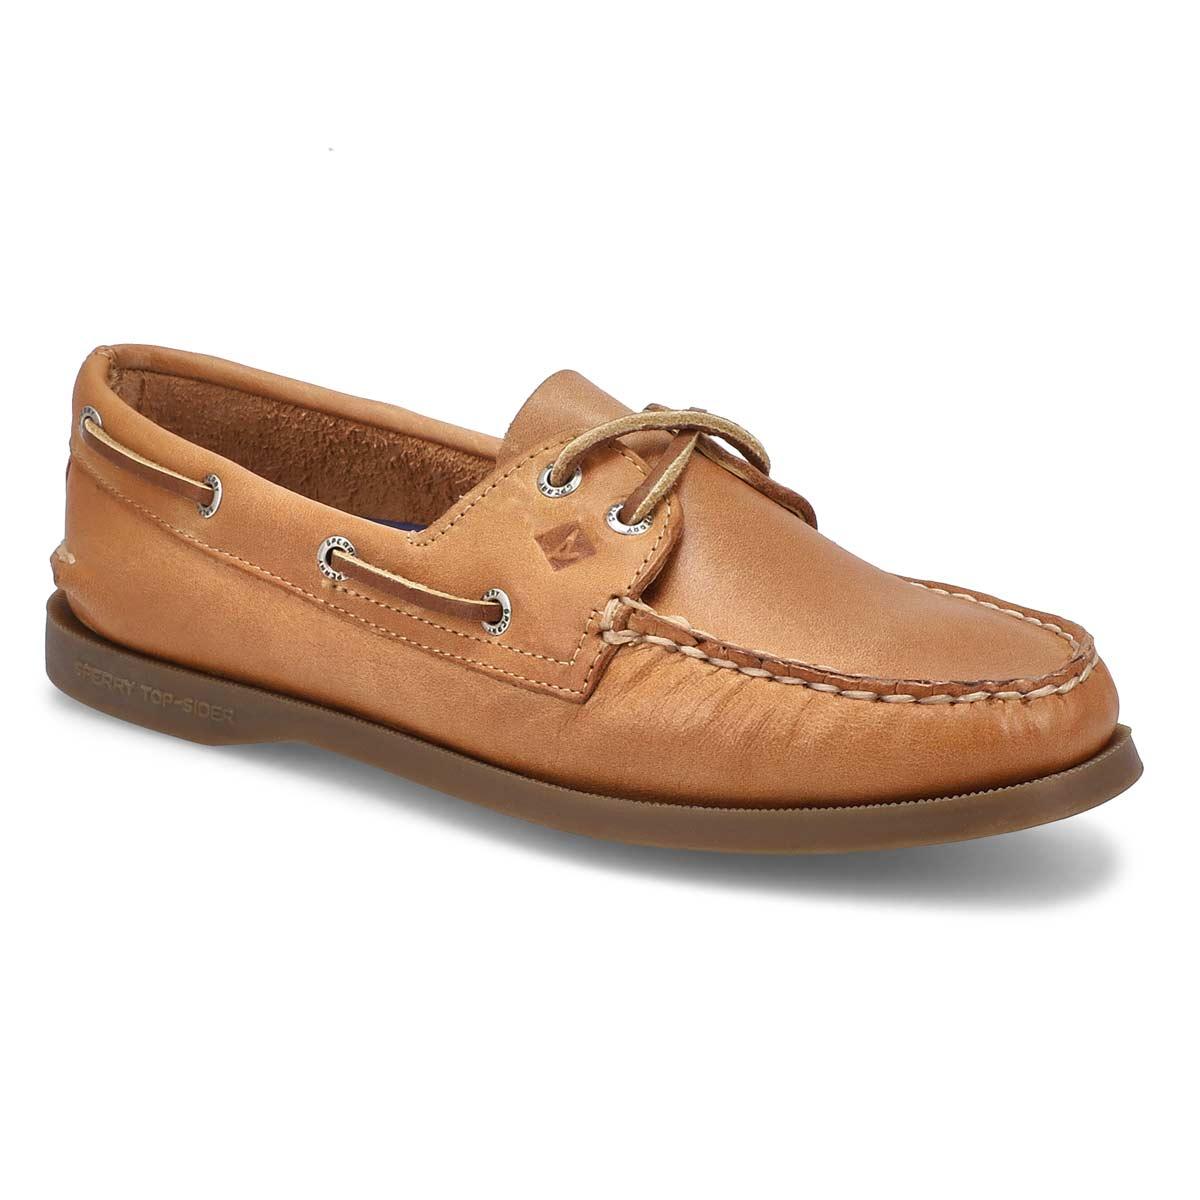 Women's Authentic Original Boat Shoe- Sahara